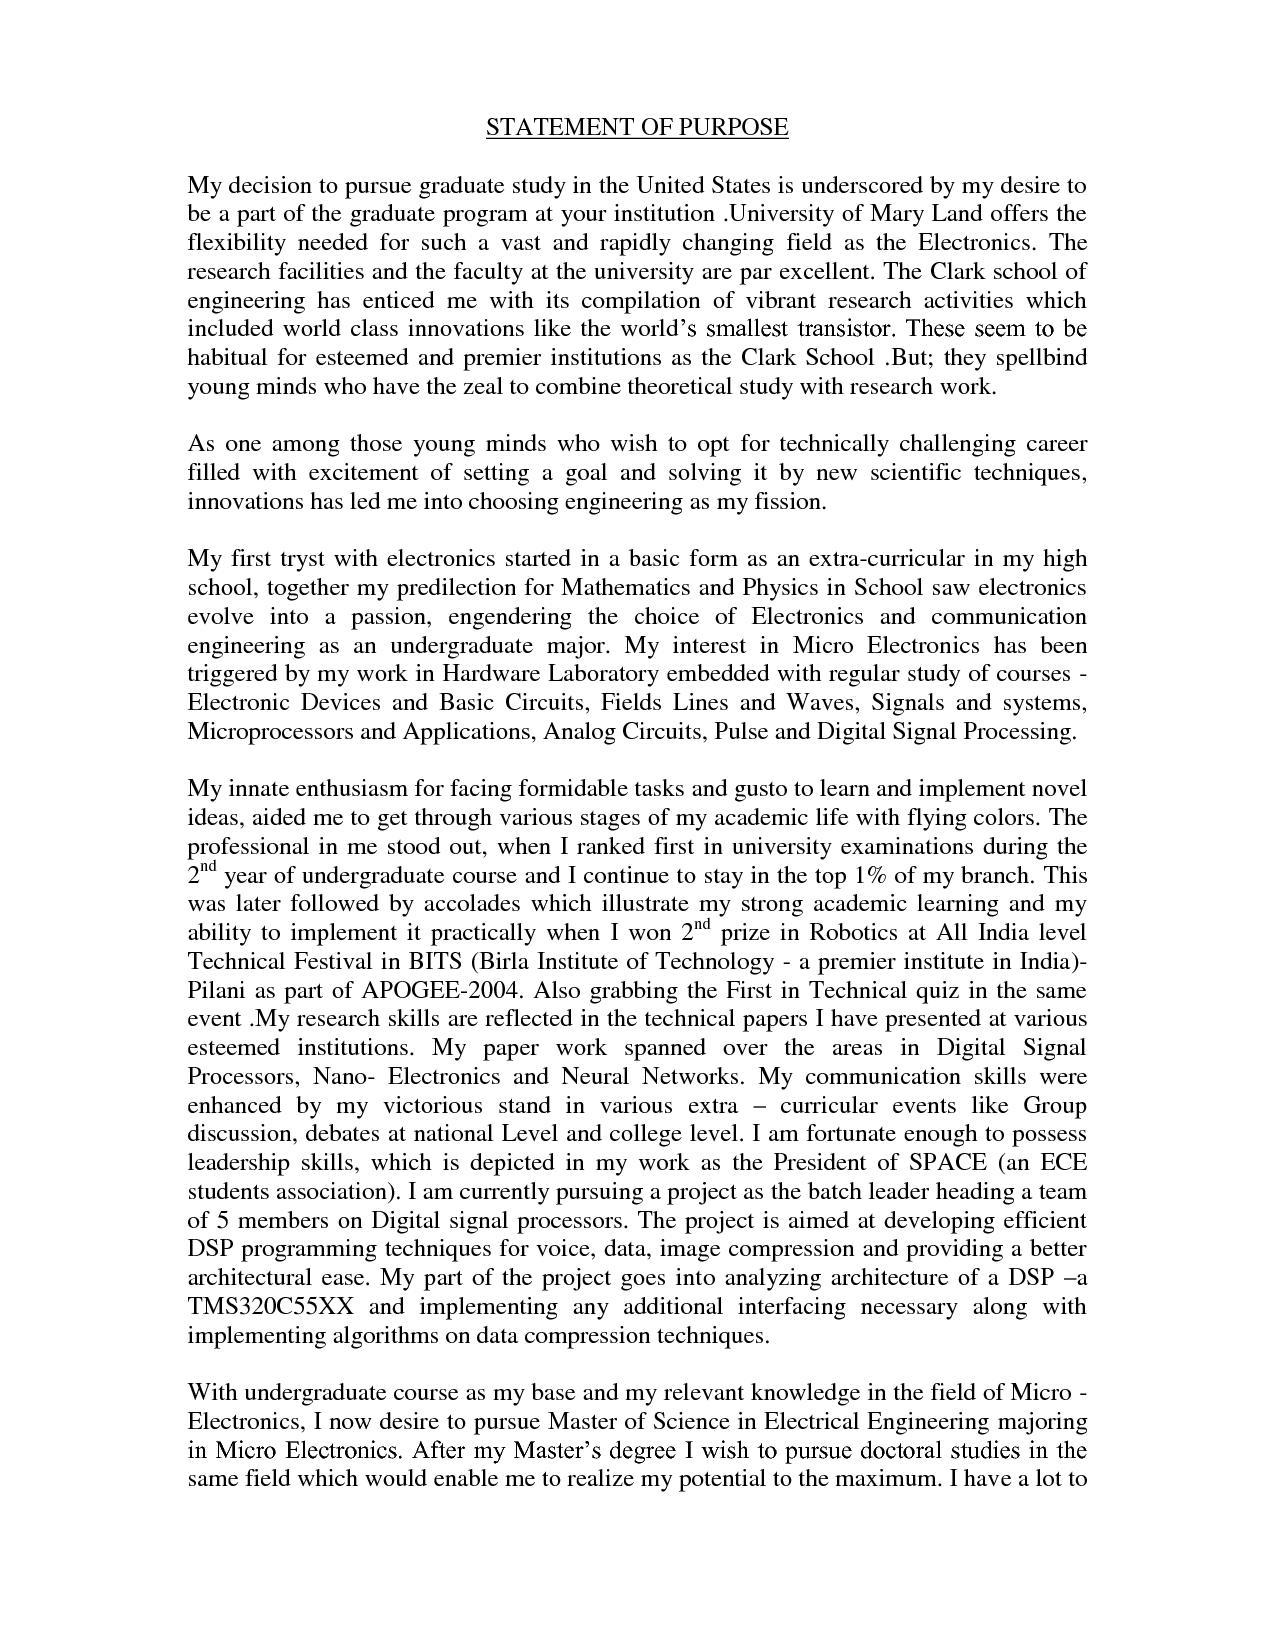 007 Essay Example Statement Of Interest Sample Template M80ewg4r Usc Sensational Prompt Prompts Engineering 2017 Full